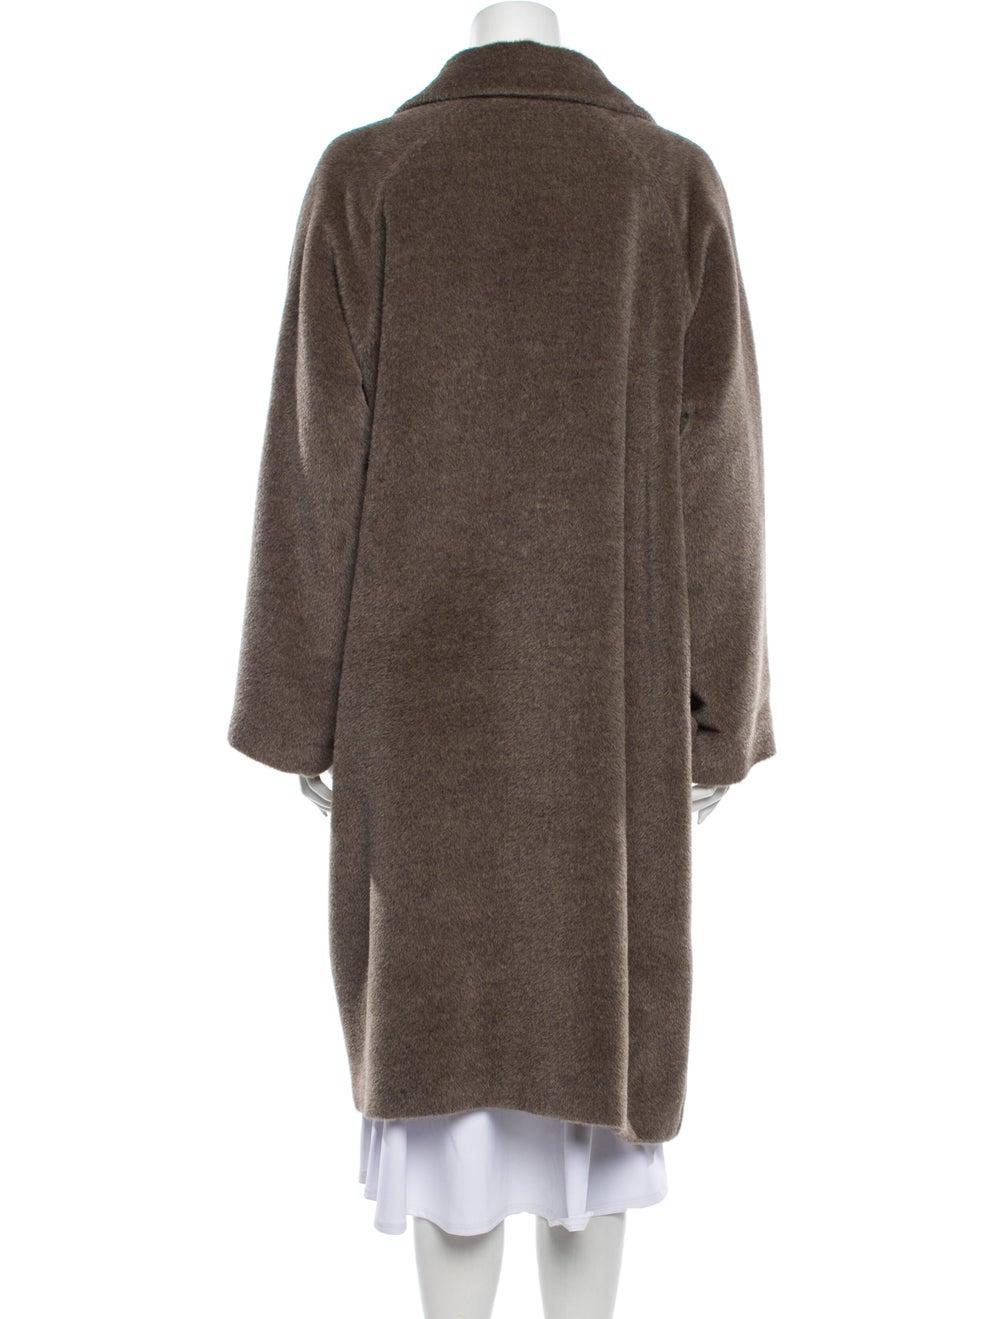 Max Mara Alpaca Coat - image 3